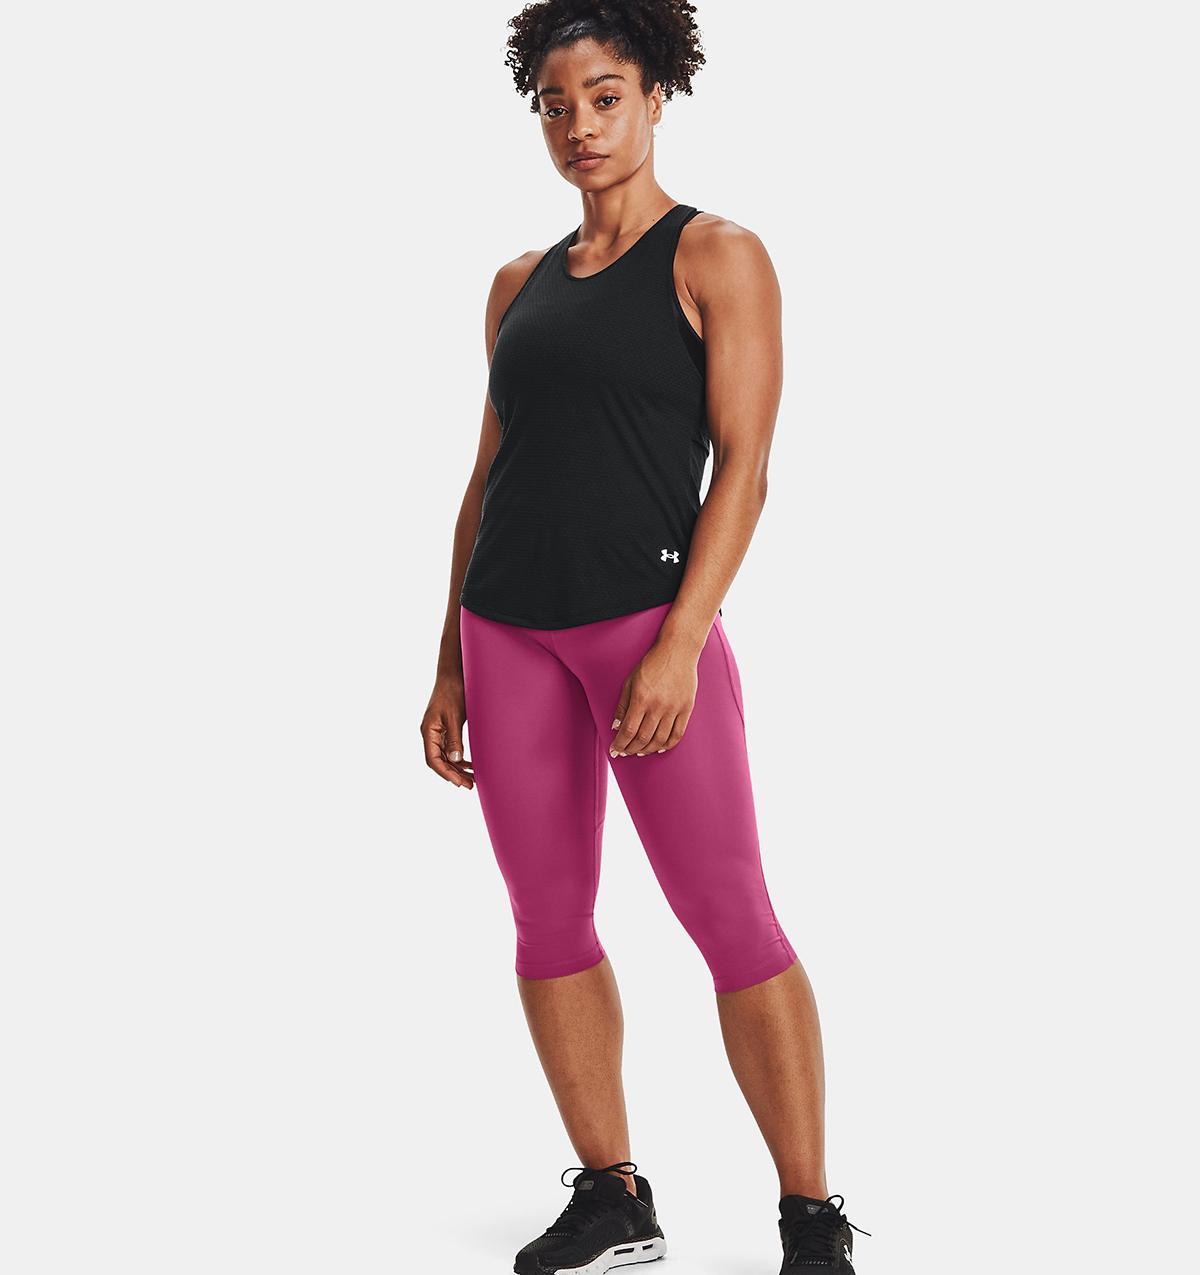 Women's Under Armour Streaker Run Tank - Color: Black/Black/Reflective - Size: XS, Black/Black/Reflective, large, image 1